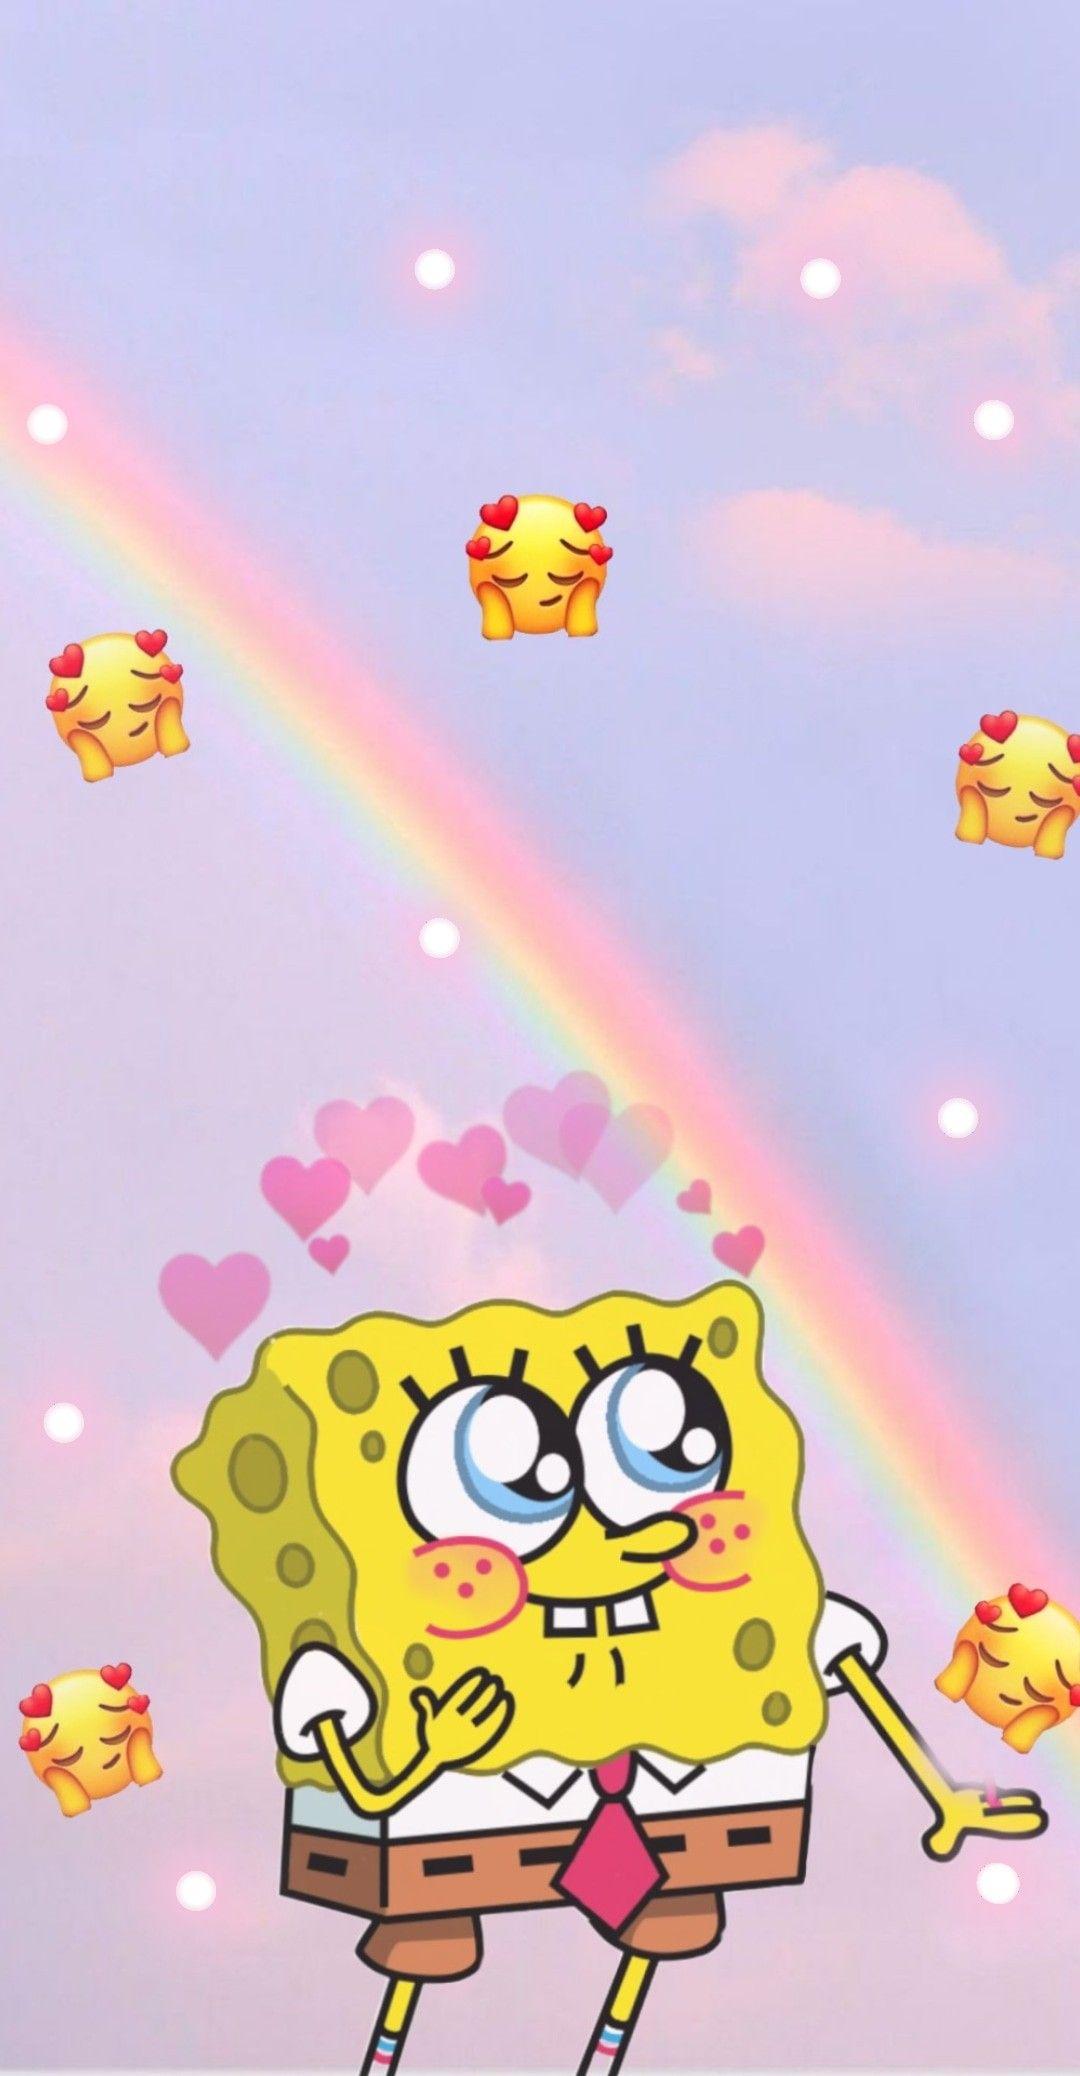 Spongebob In Love Spongebob Wallpaper Spongebob Cute Disney Wallpaper